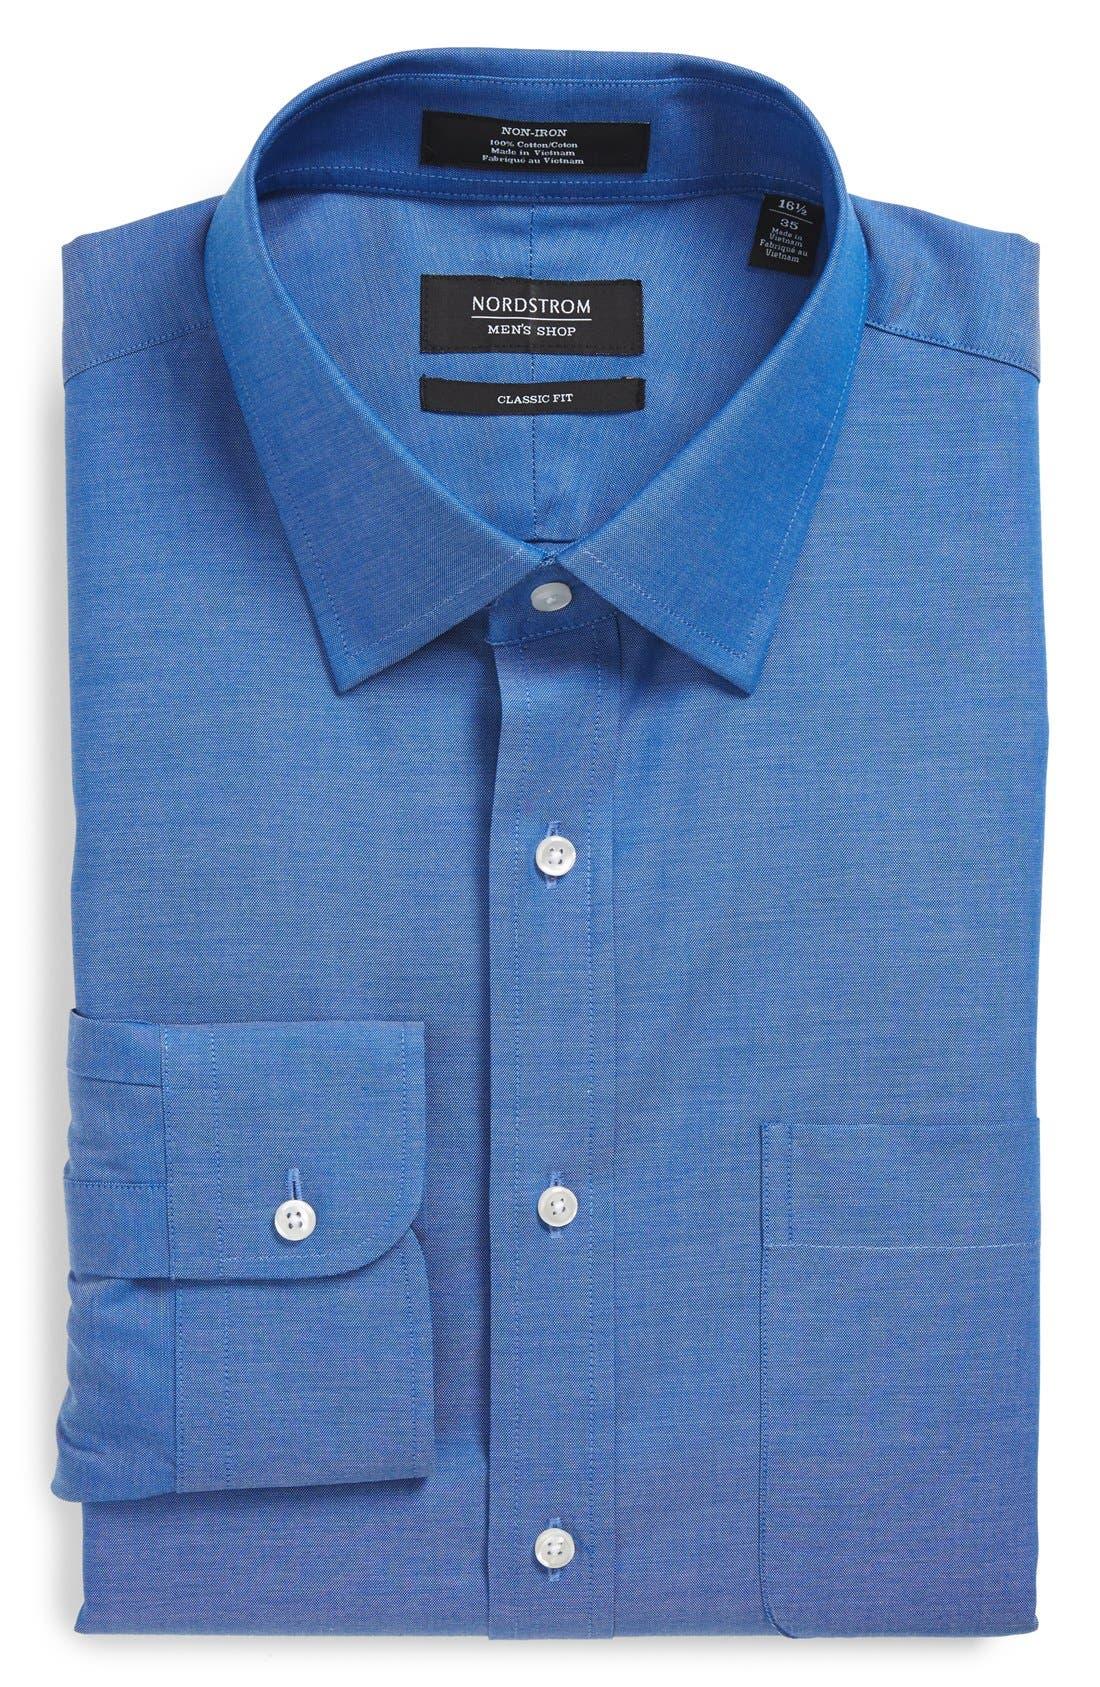 Nordstrom Men's Shop Classic Fit Non-Iron Solid Dress Shirt